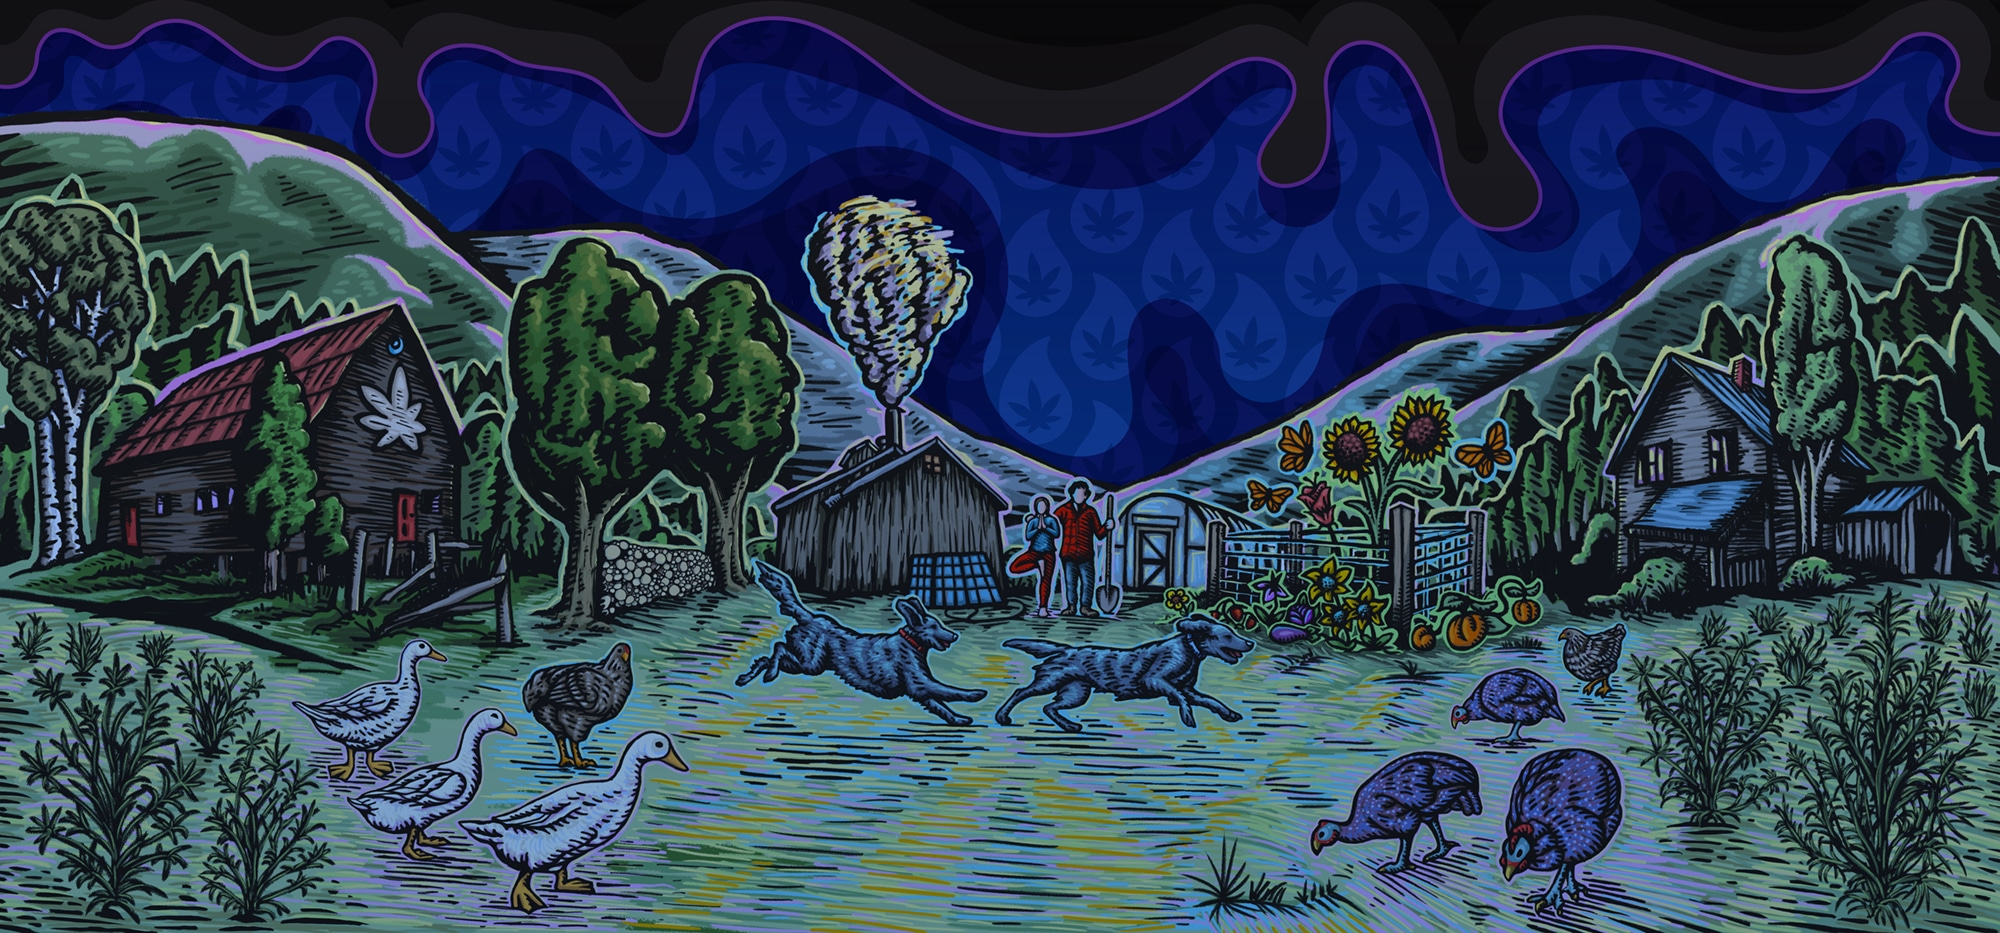 Illustration of Vermont Farmacy organic hemp farm, modified for Liquid Blue with rainy sky and cyan overtones